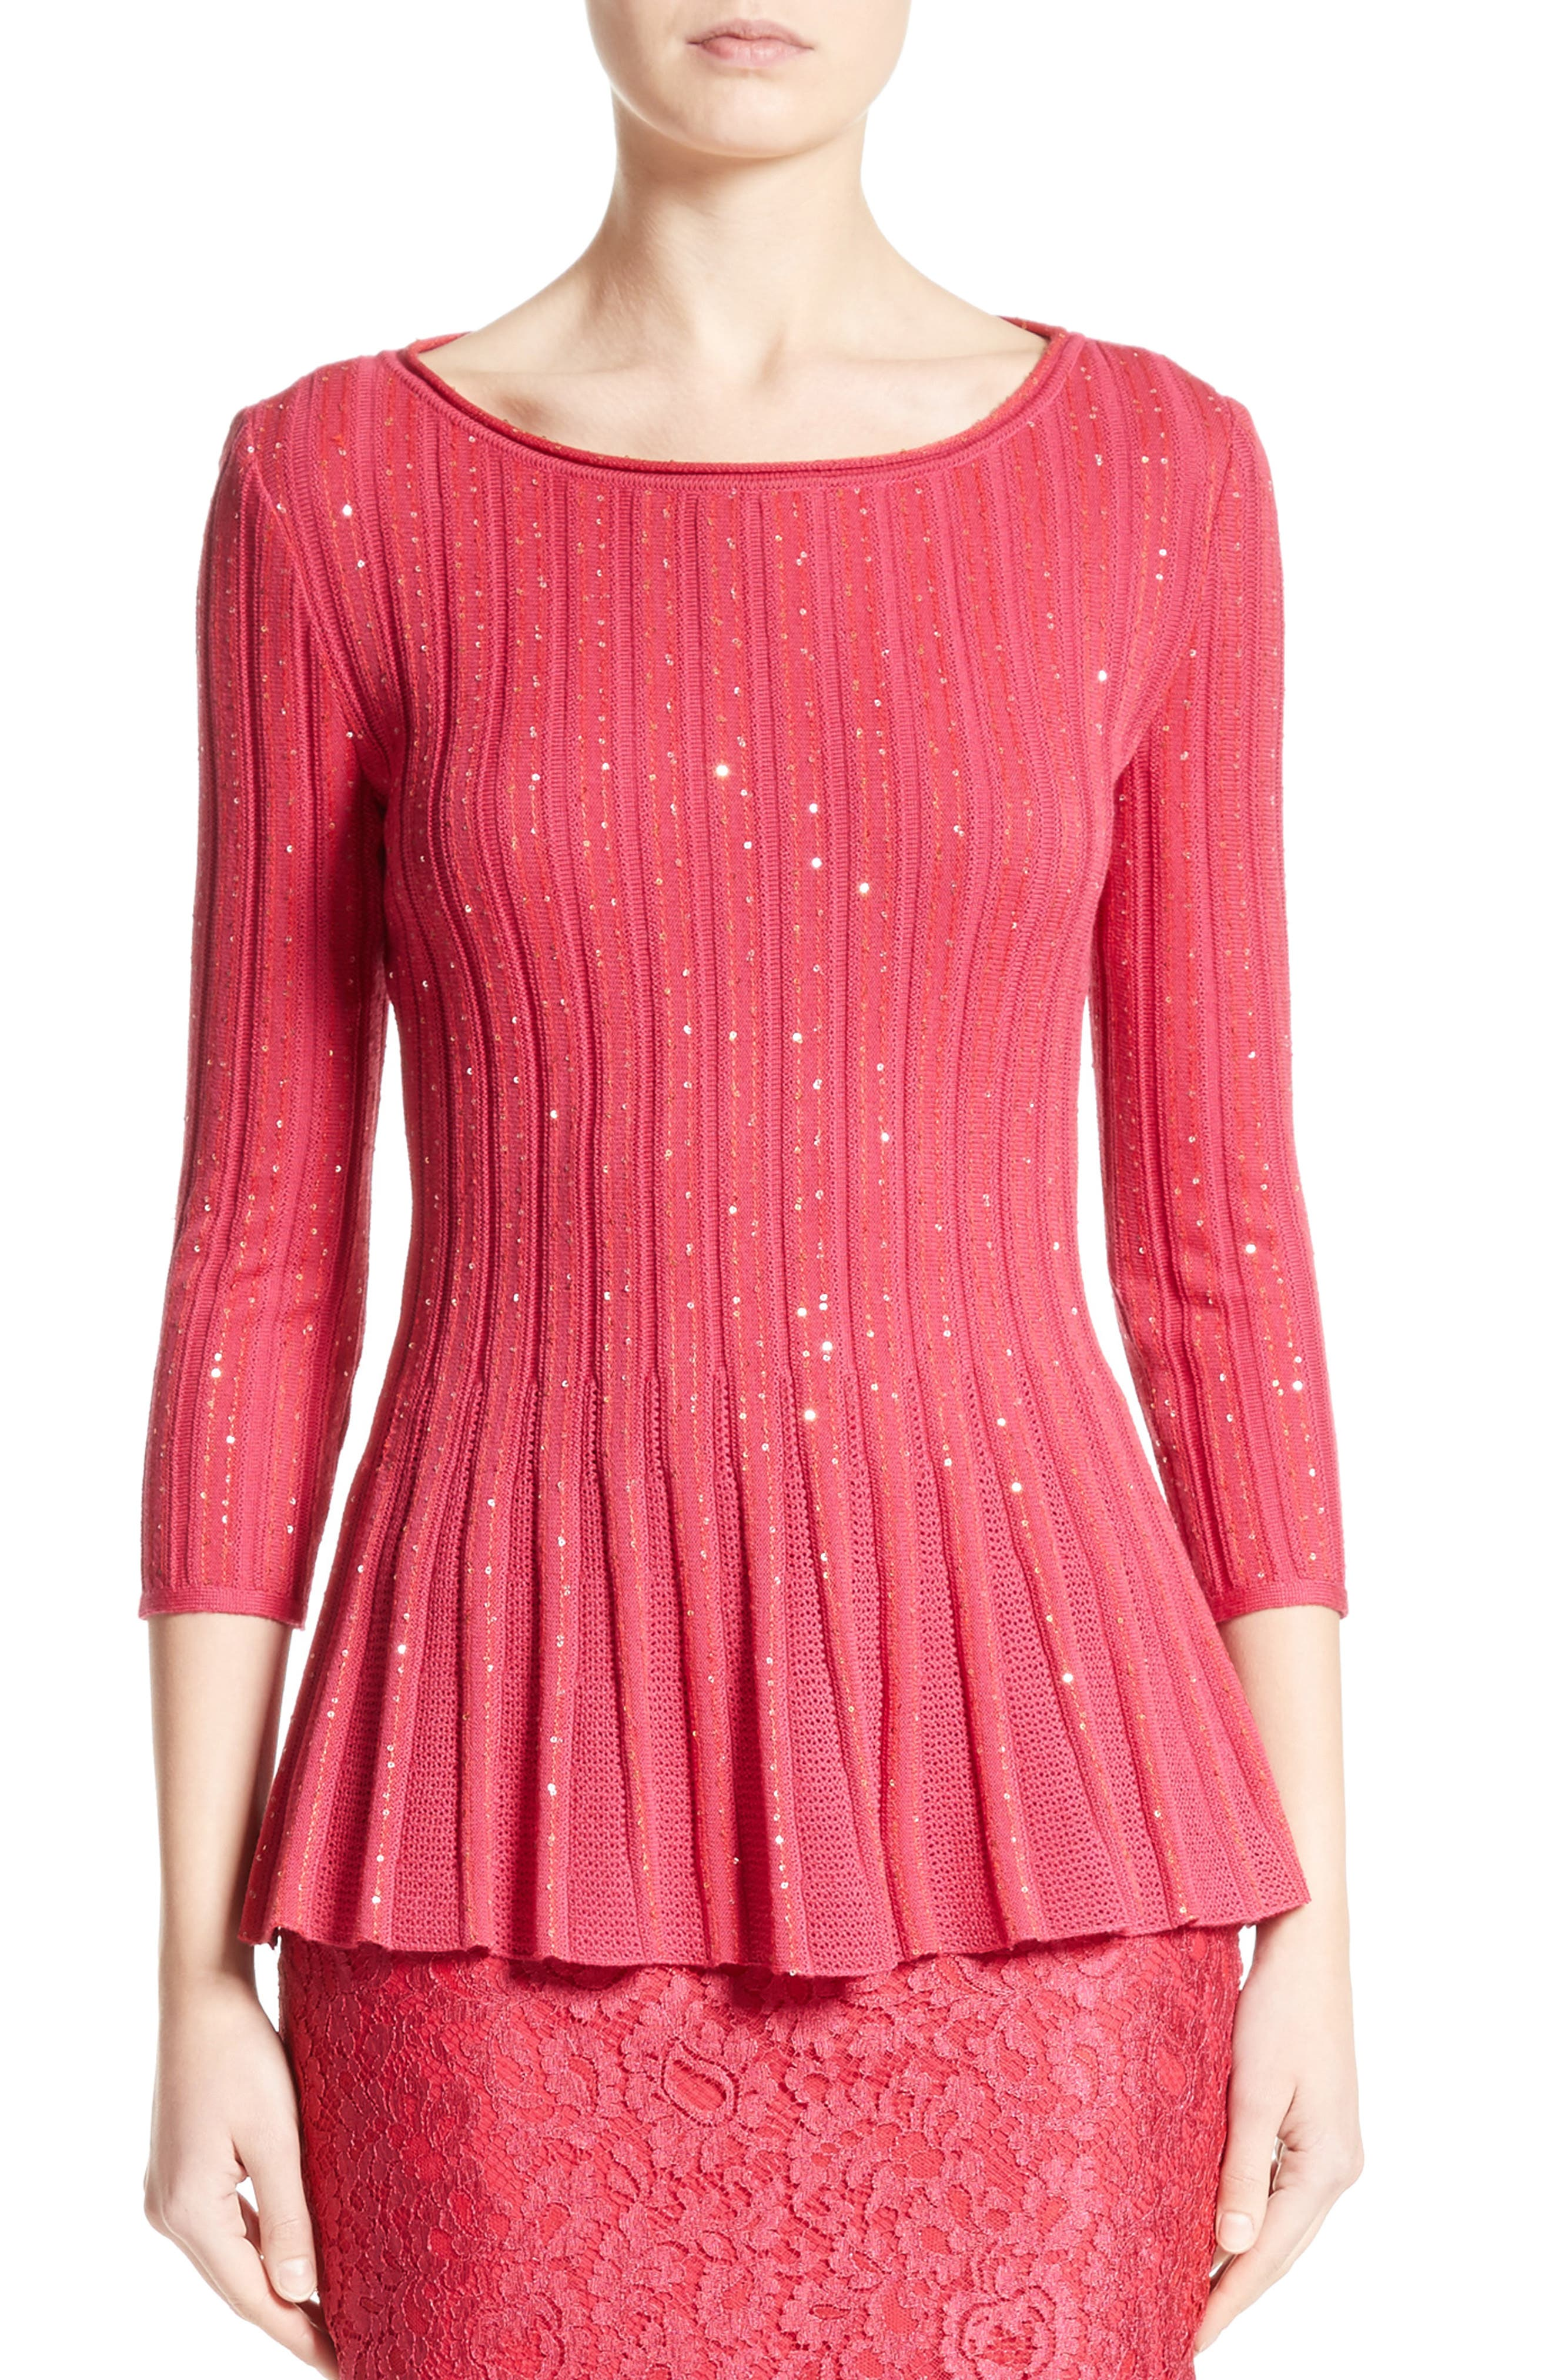 Chriag Sequin Knit Peplum Top,                             Main thumbnail 1, color,